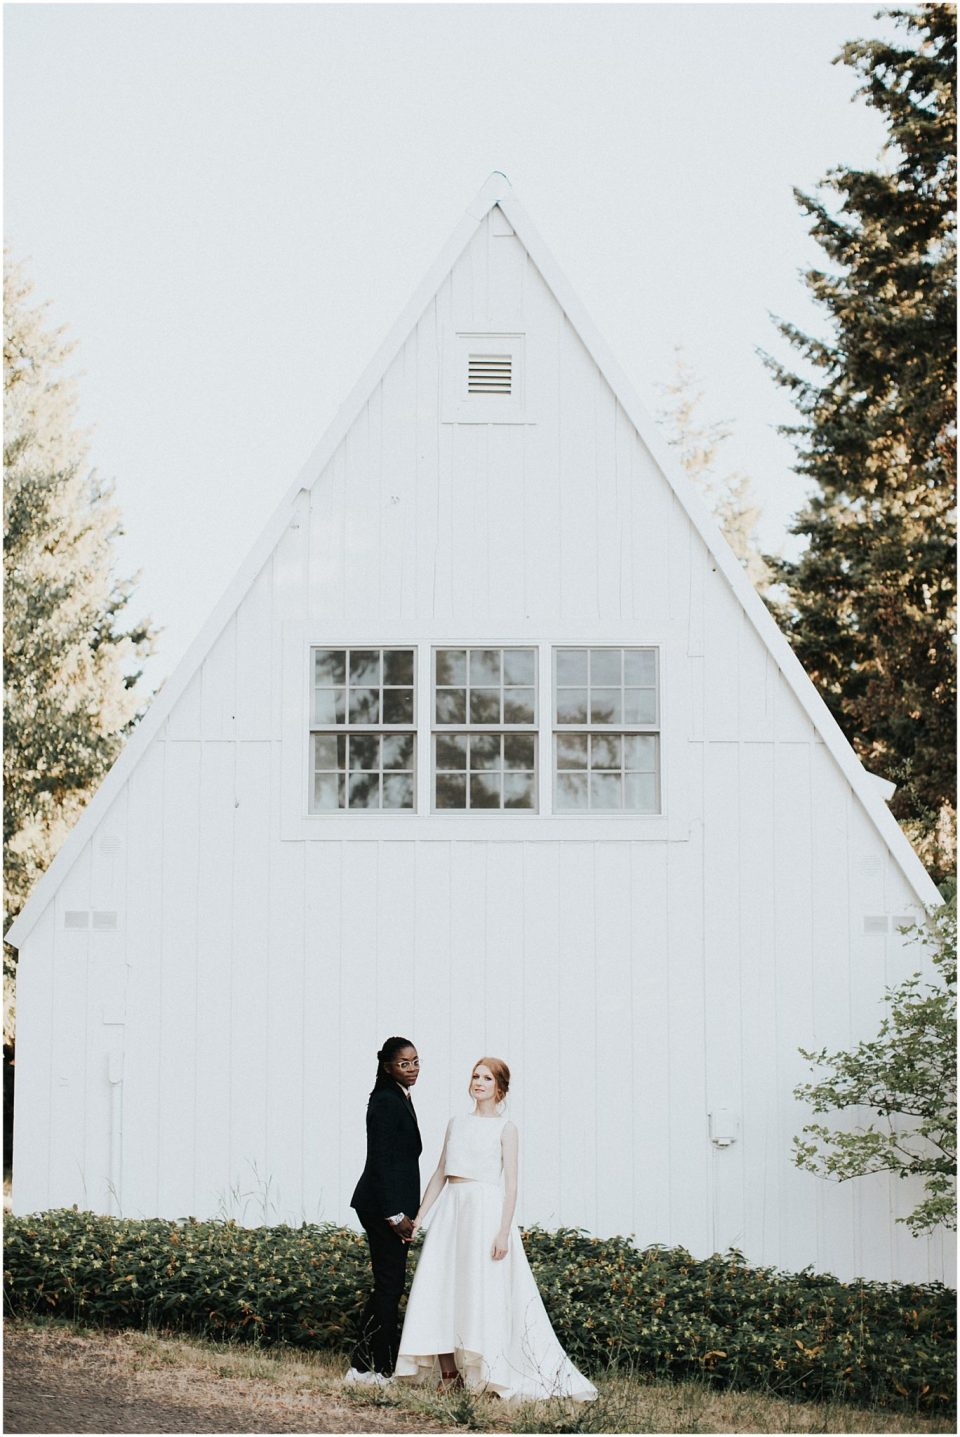 hollis-brittany-sullivan&sullivan-hoodriverwedding (44 of 54)_seattle wedding.jpg